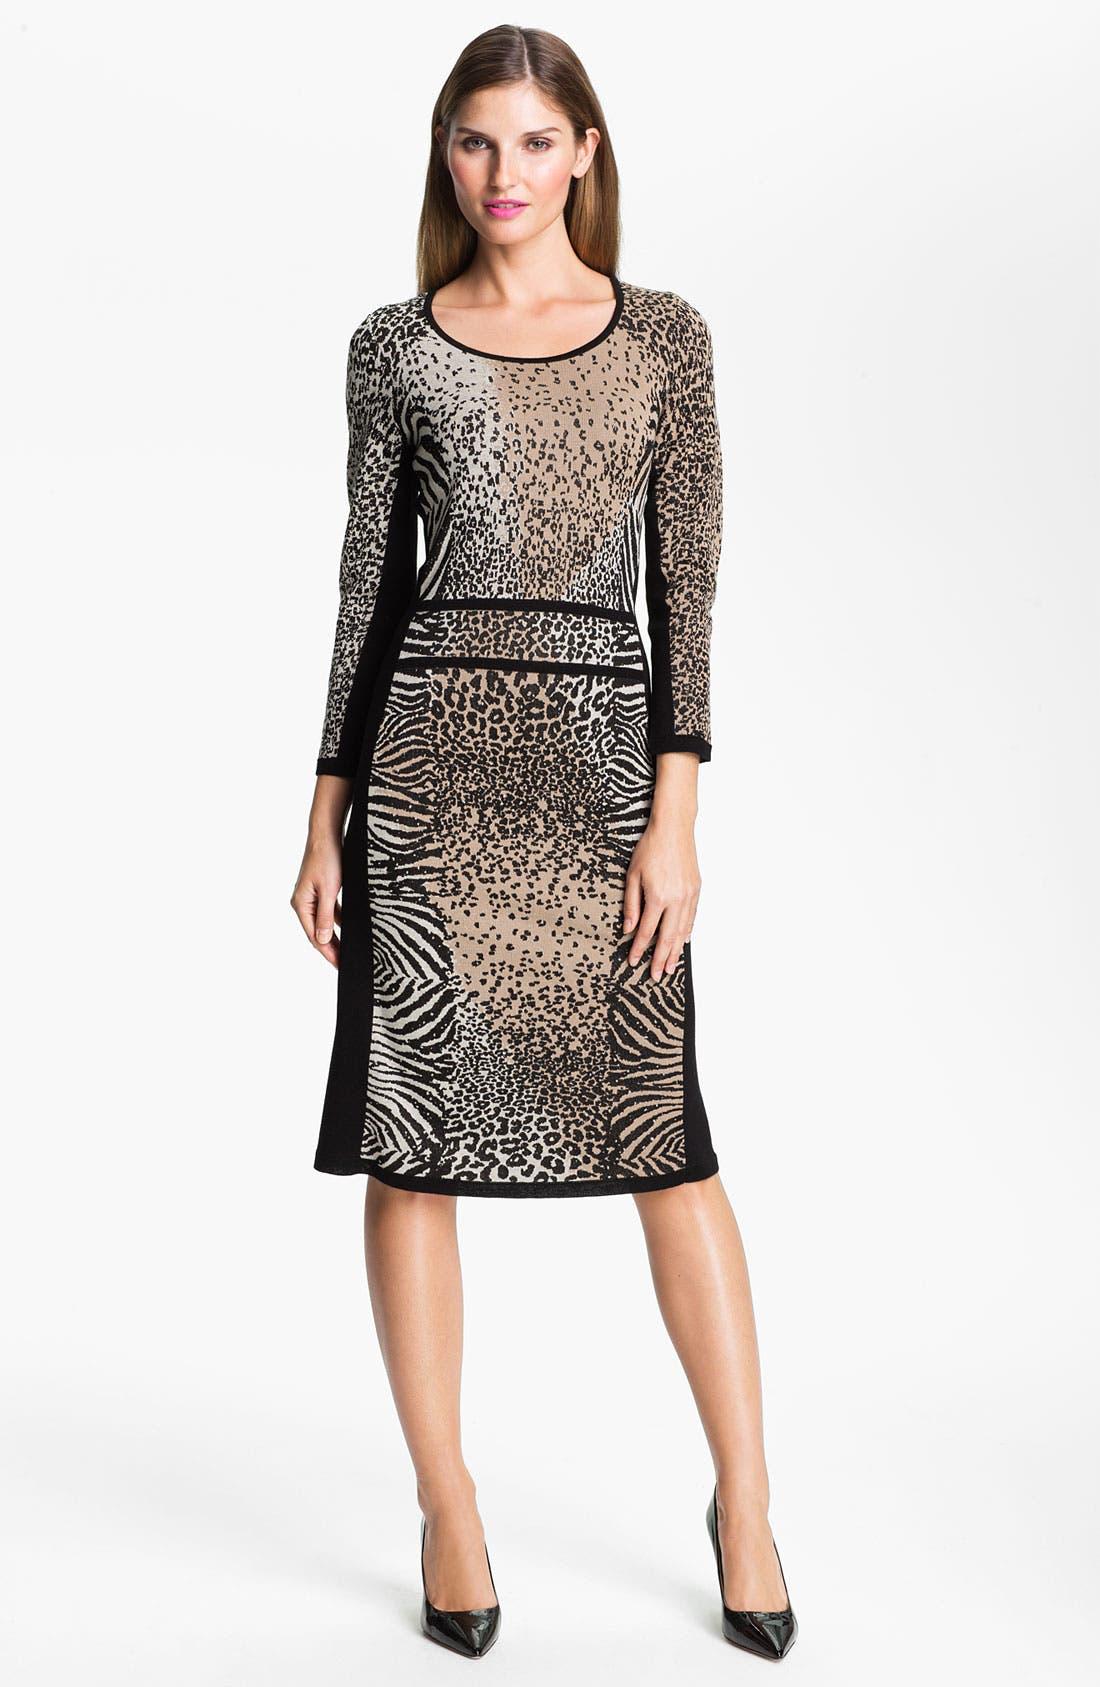 Alternate Image 1 Selected - Nic + Zoe 'Wild Deco' Dress (Online Exclusive)